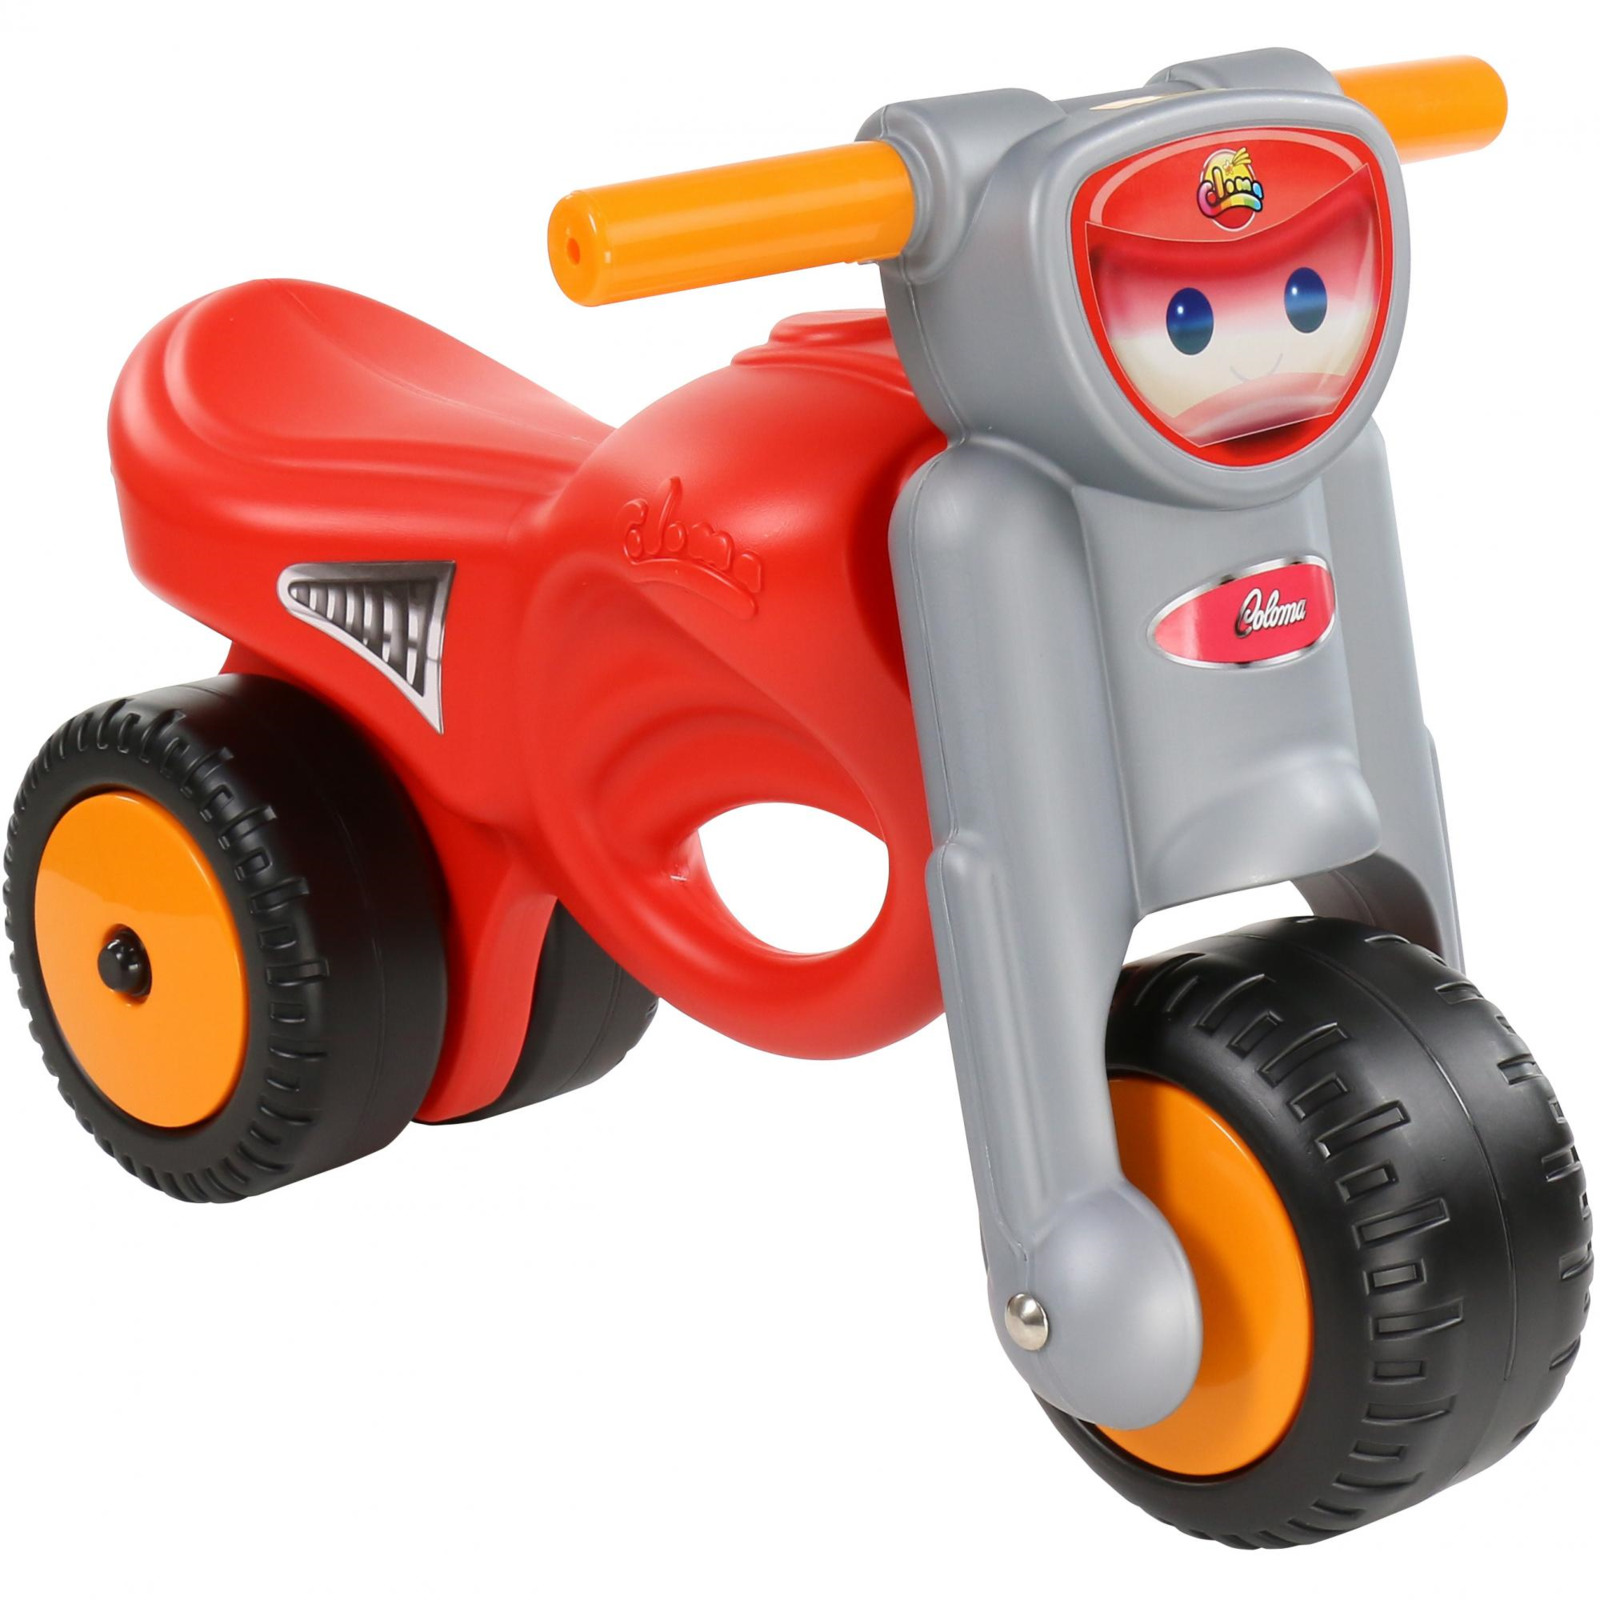 "Мотоцикл-каталка Полесье ""Мини-мото"", цвет в ассортименте"